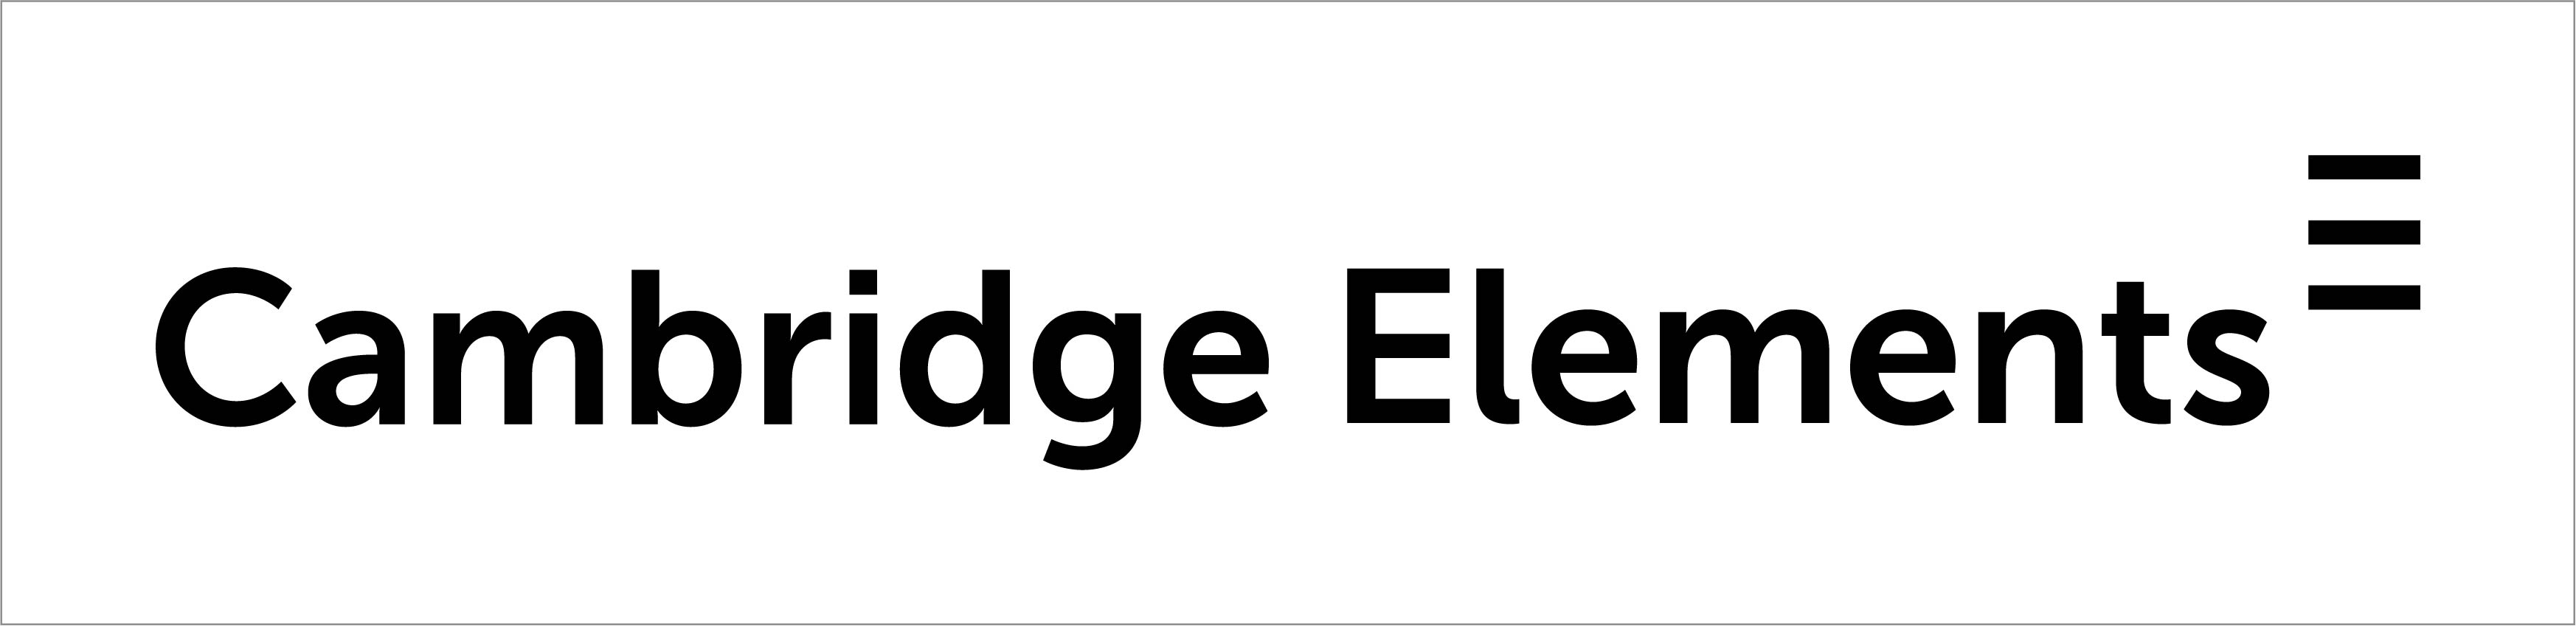 Cambridge Elements